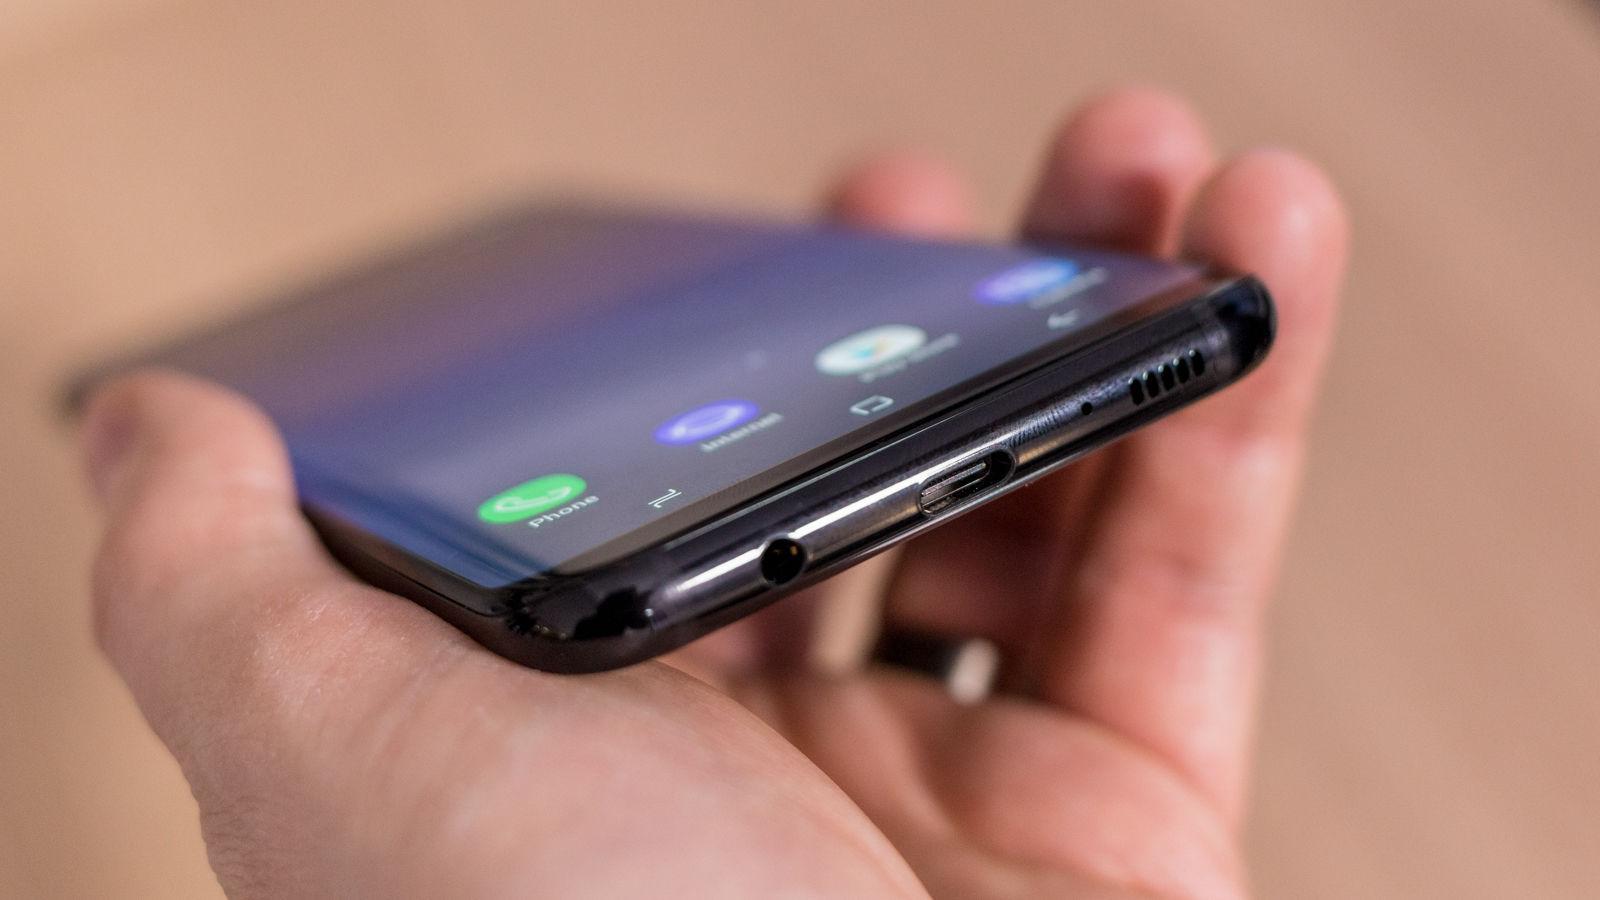 Promo Samsung Galaxy S8 Smartphone Midnight Black 64gb 4gb N Terbaru Valentino Rudy Vr112 2337s Jam Tangan Wanita Silver Hands On Plus Review Gagadget For Now